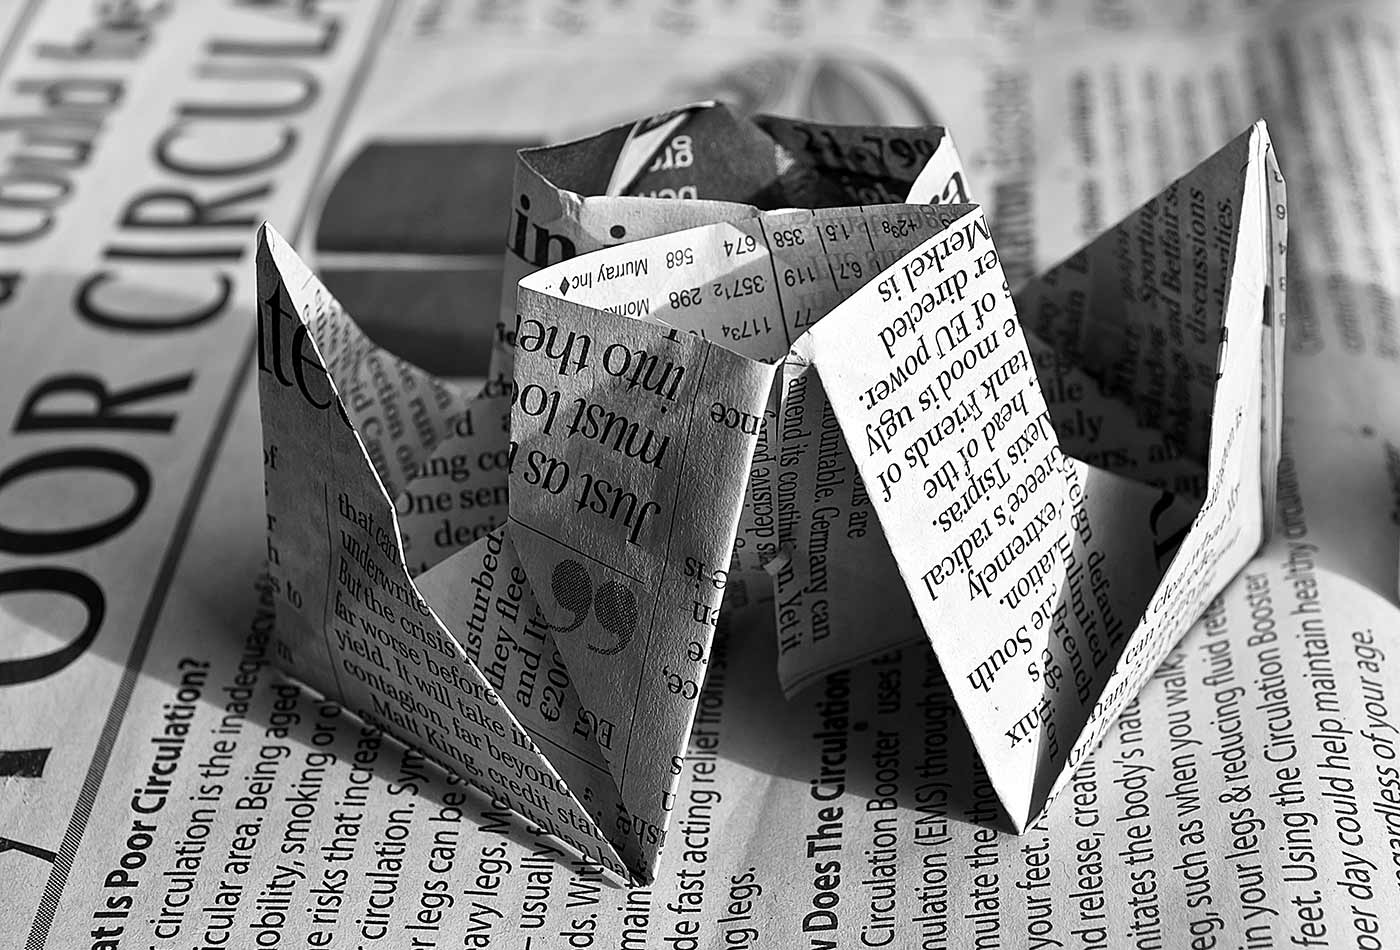 Newspaper oragami.